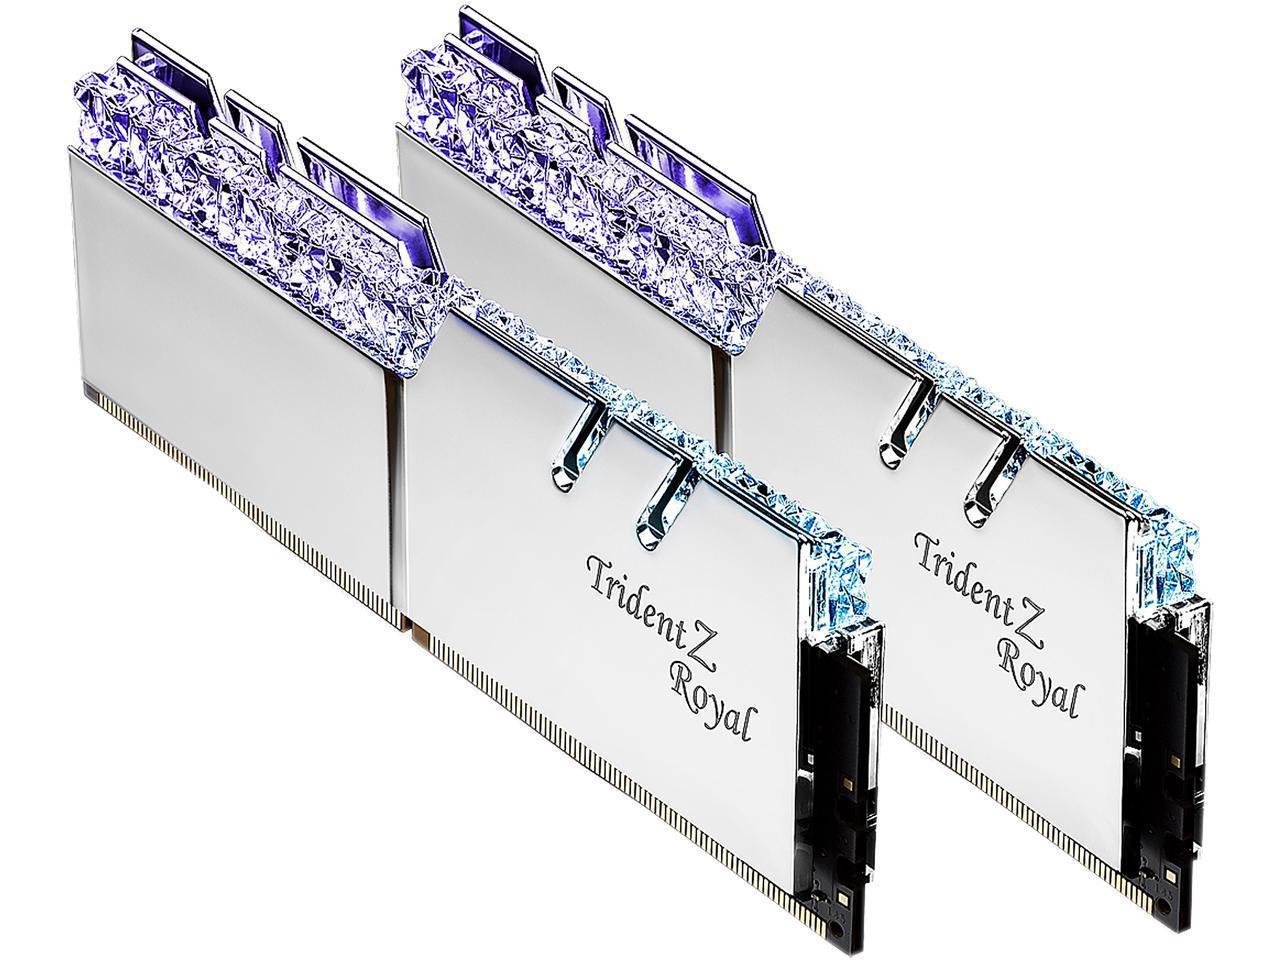 Review: G Skill Trident Z Royal 16GB DDR4-3600 (F4-3600C18D